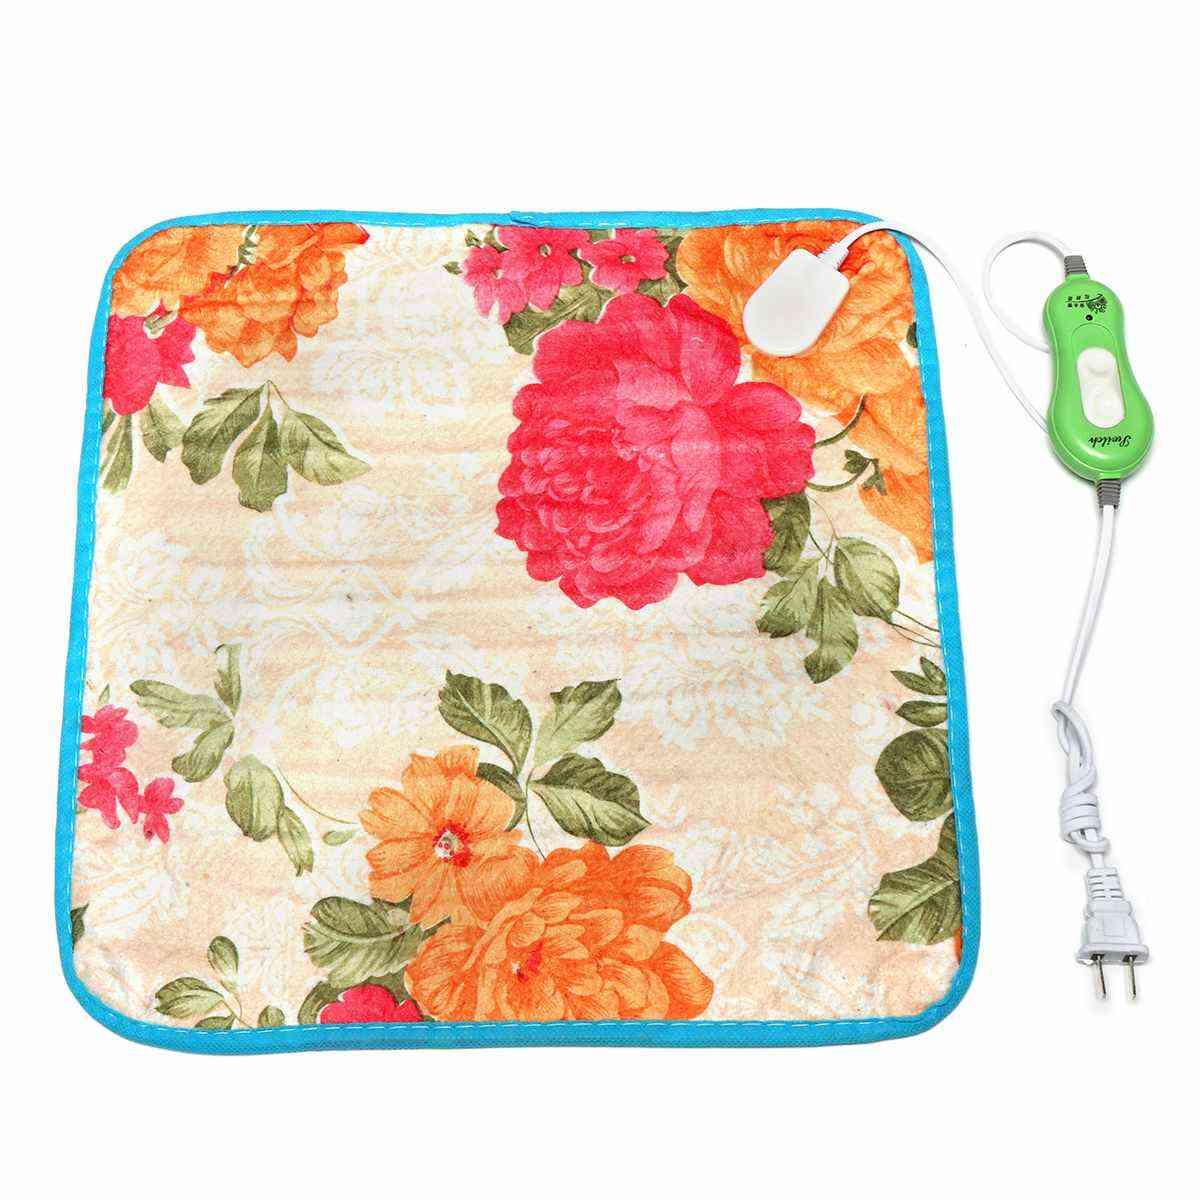 Electric Heat Pad, Temperature Adjustable Pet Bed Blanket Puppy Bunny Heater Mat